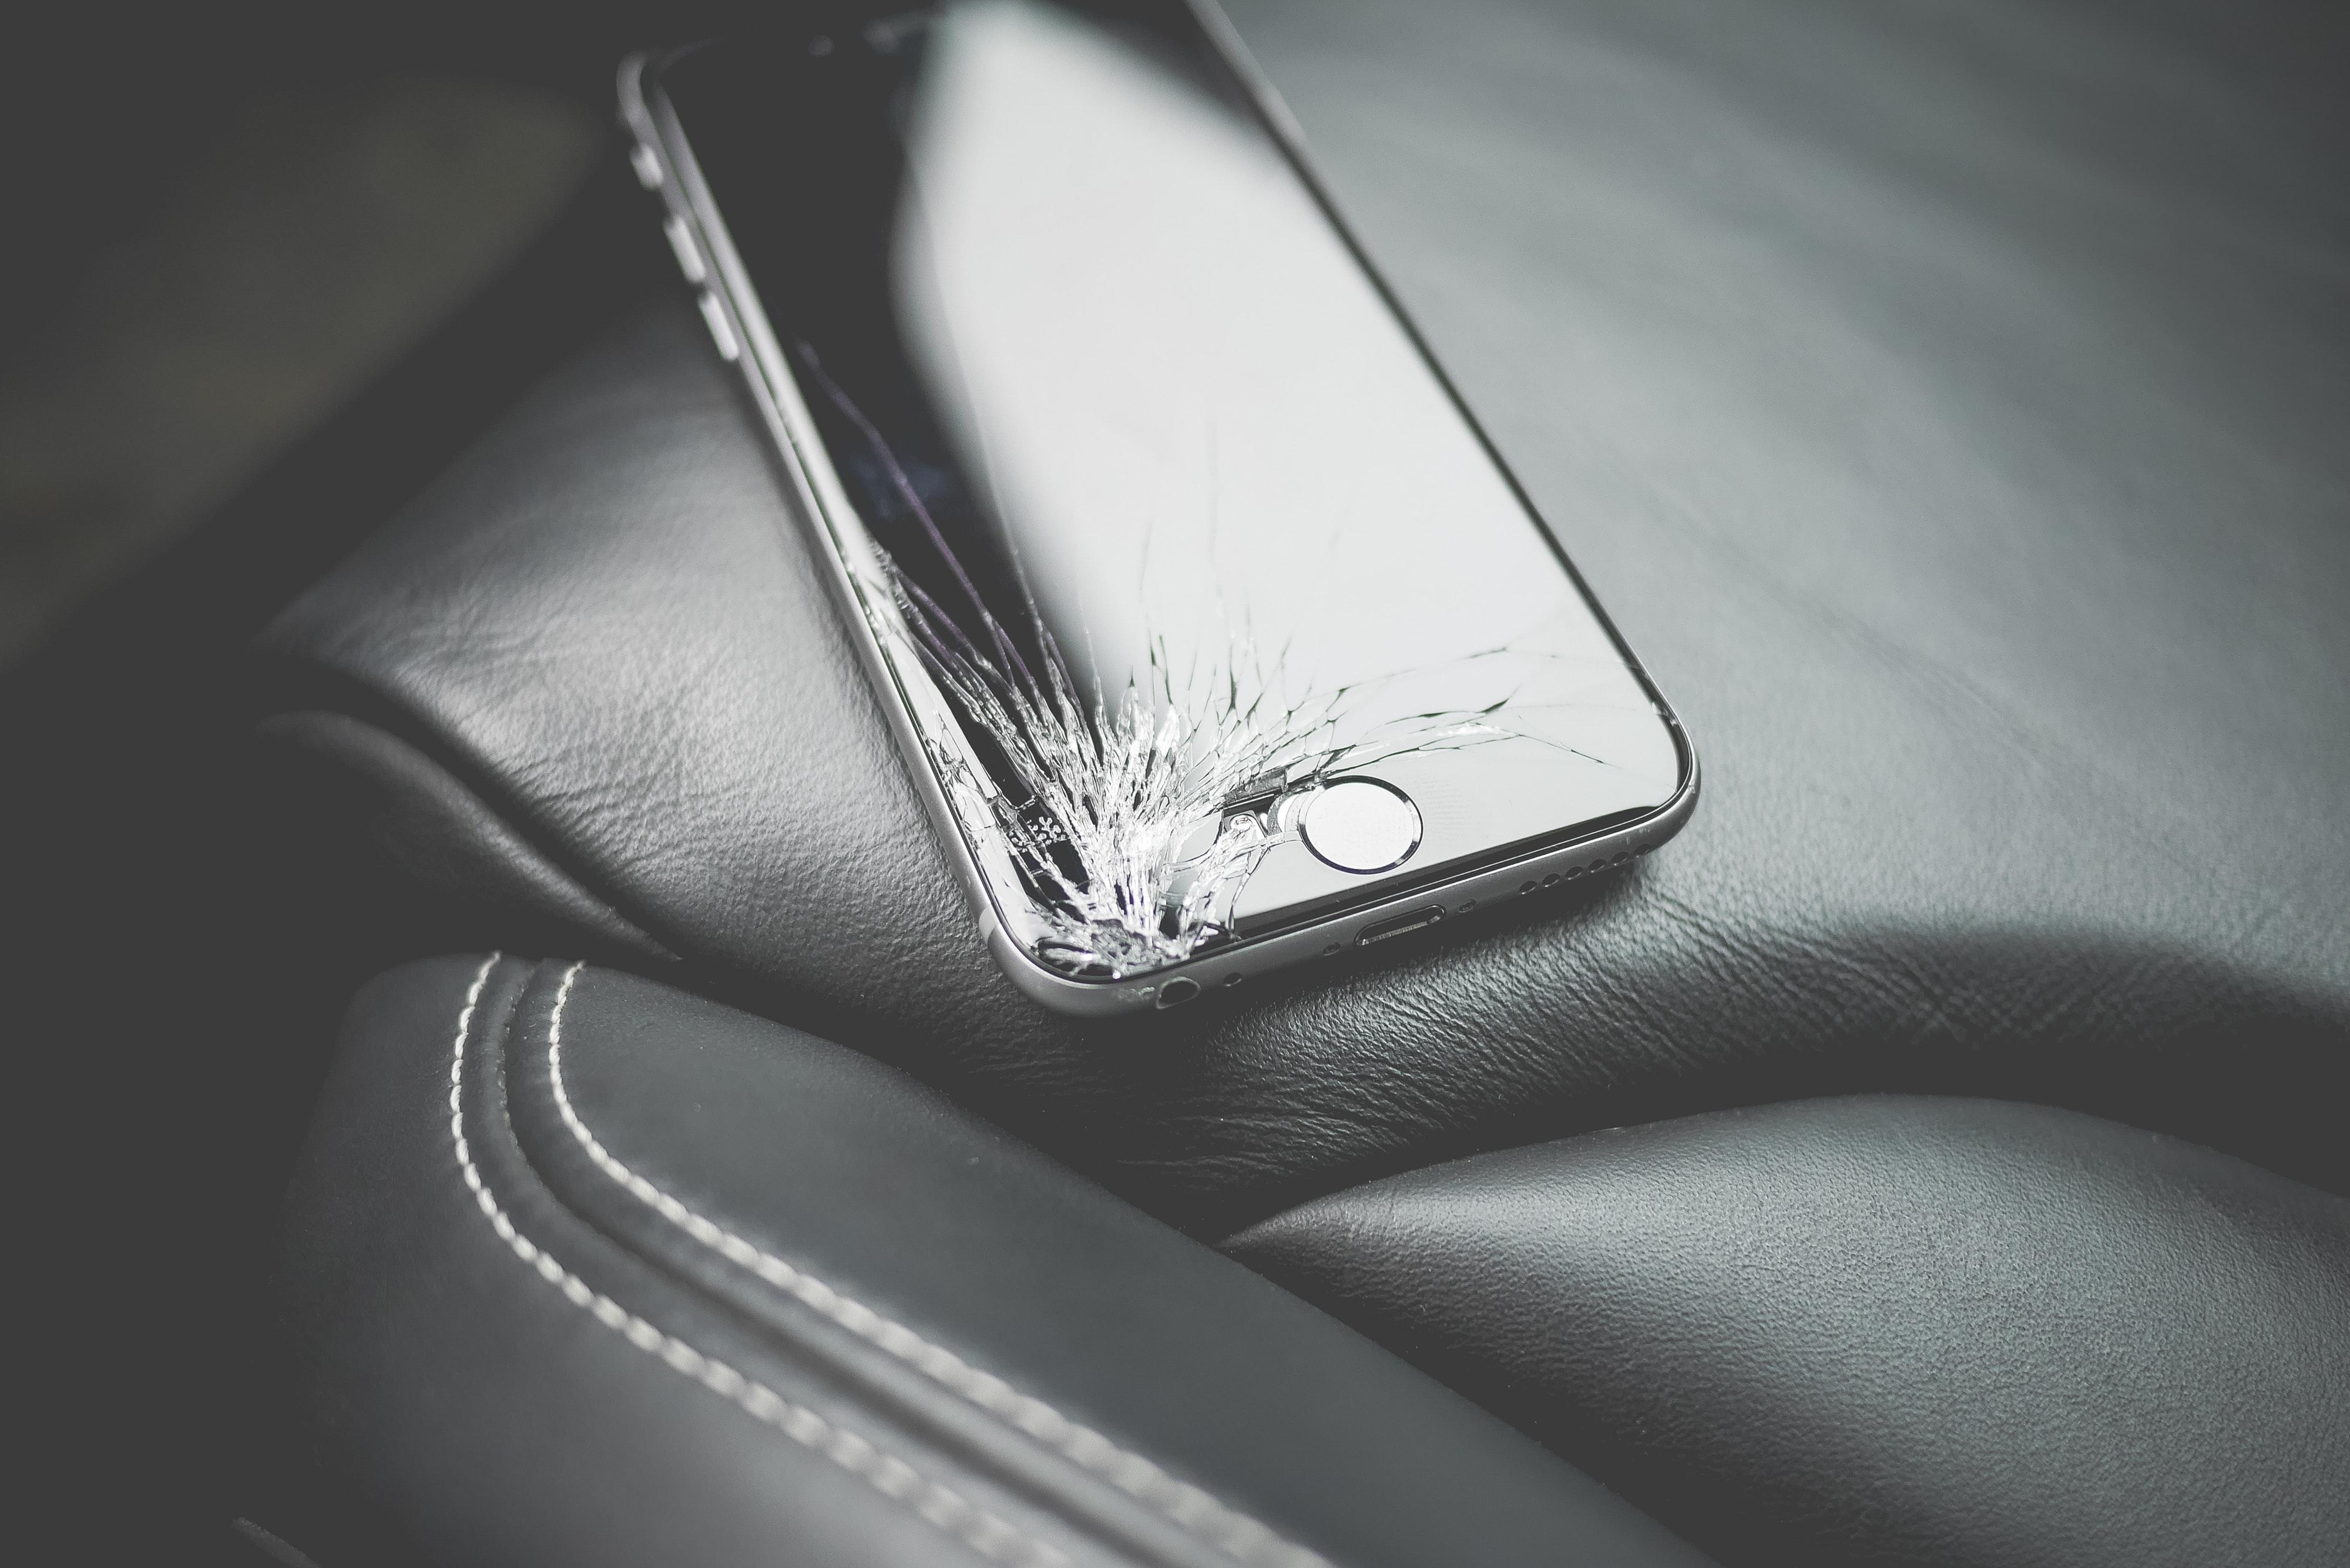 uploads///black and white brand broken